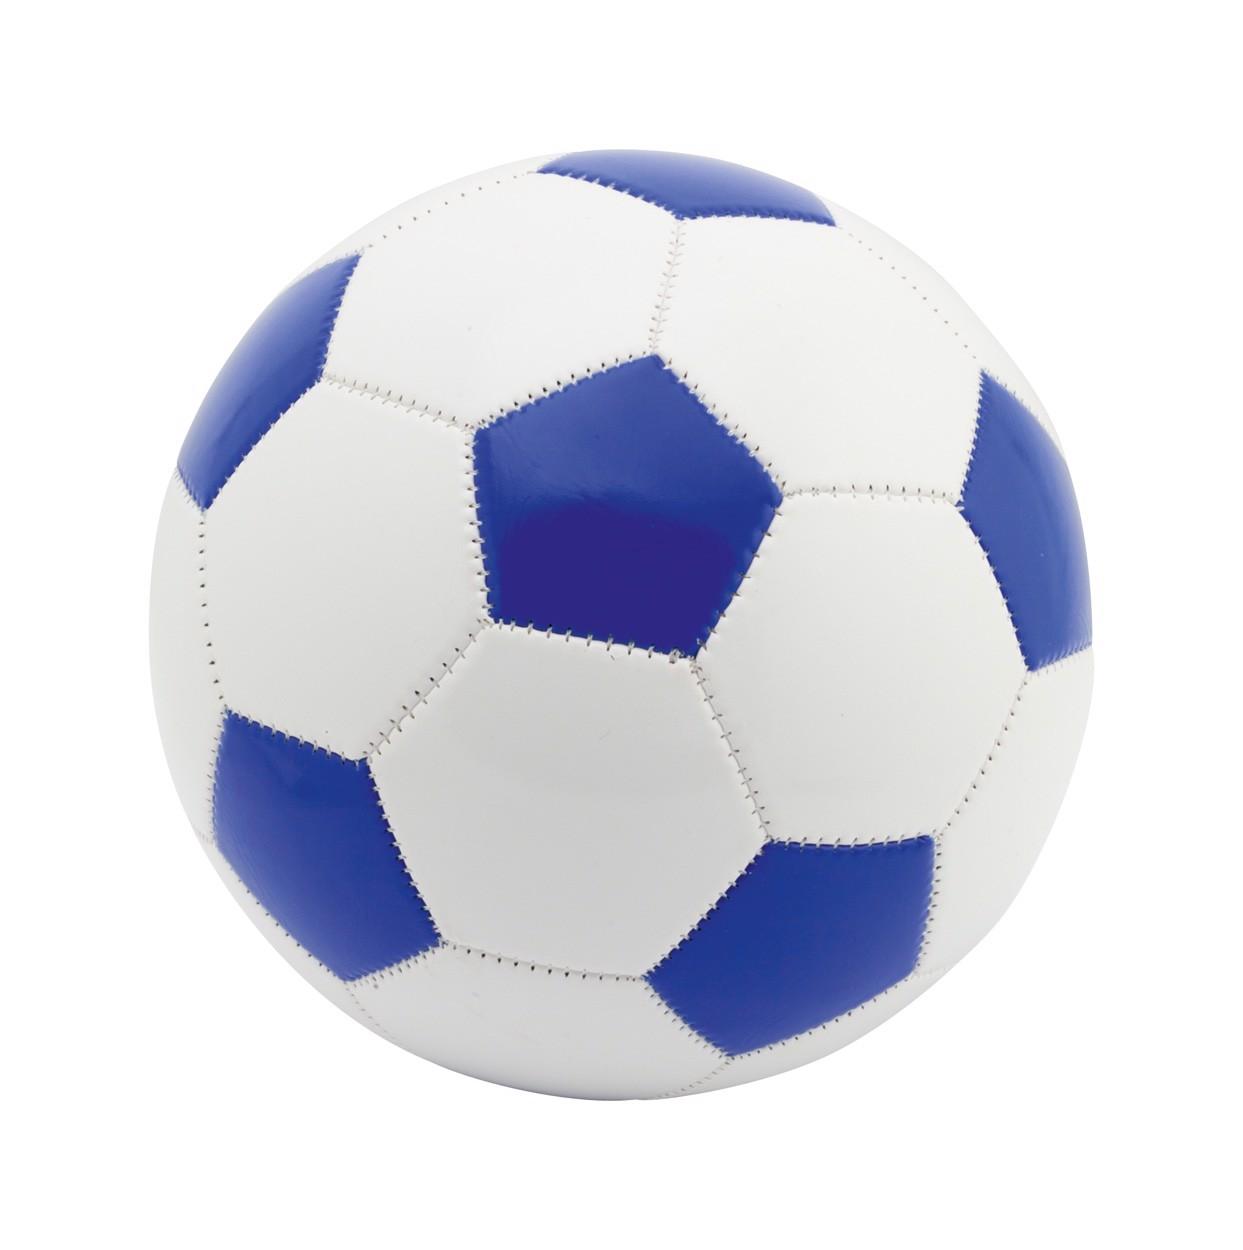 Fotbalový Míč Delko - Modrá